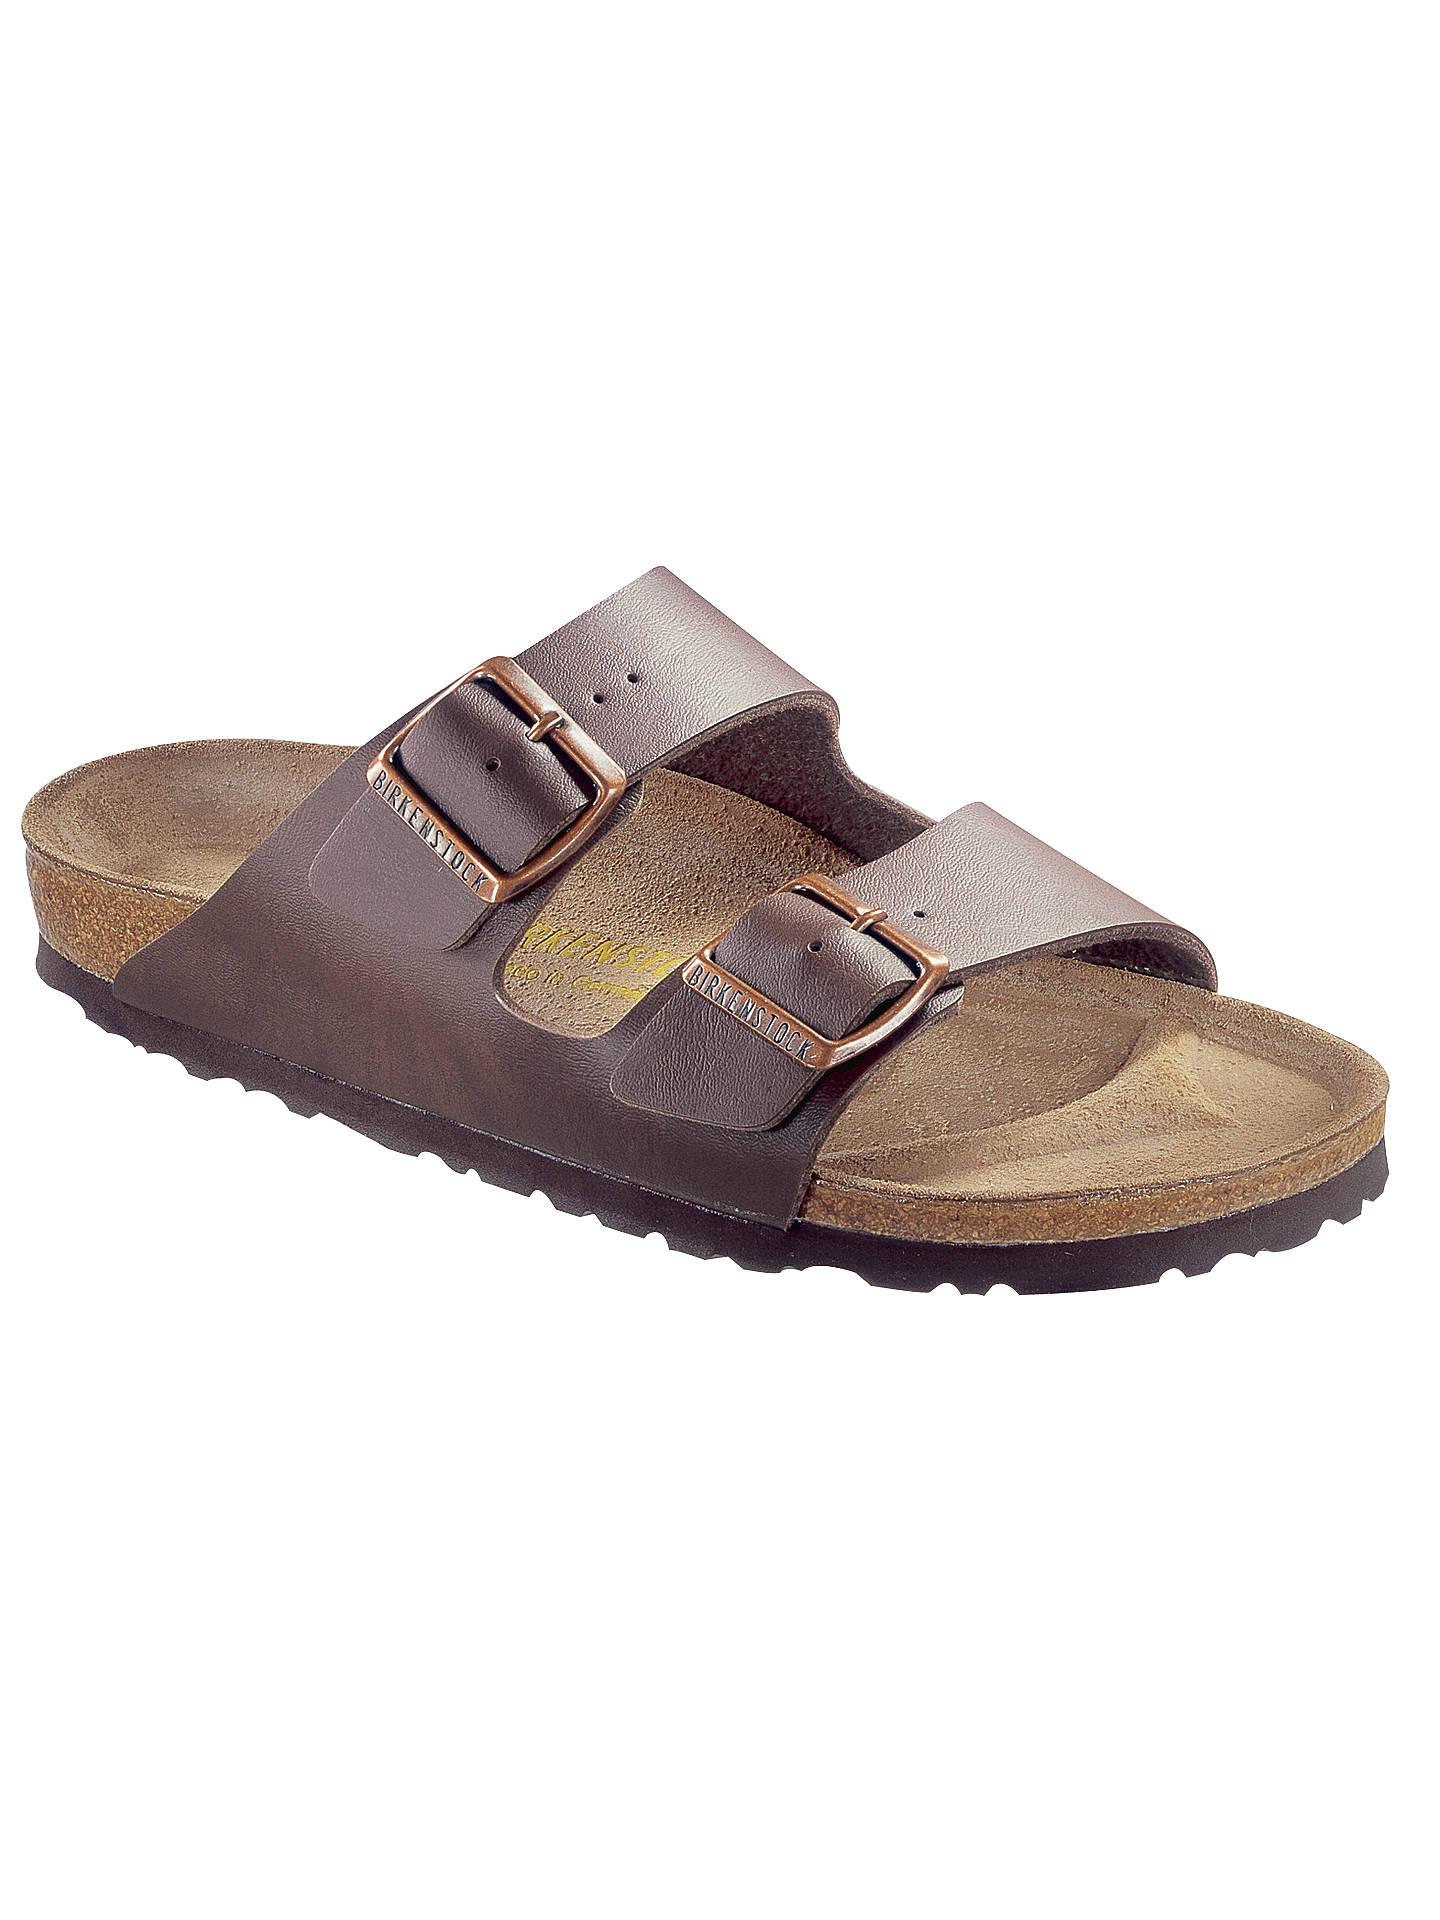 60a5acdc6f12f Buy Birkenstock Arizona Sandals, Brown, 7 Online at johnlewis.com